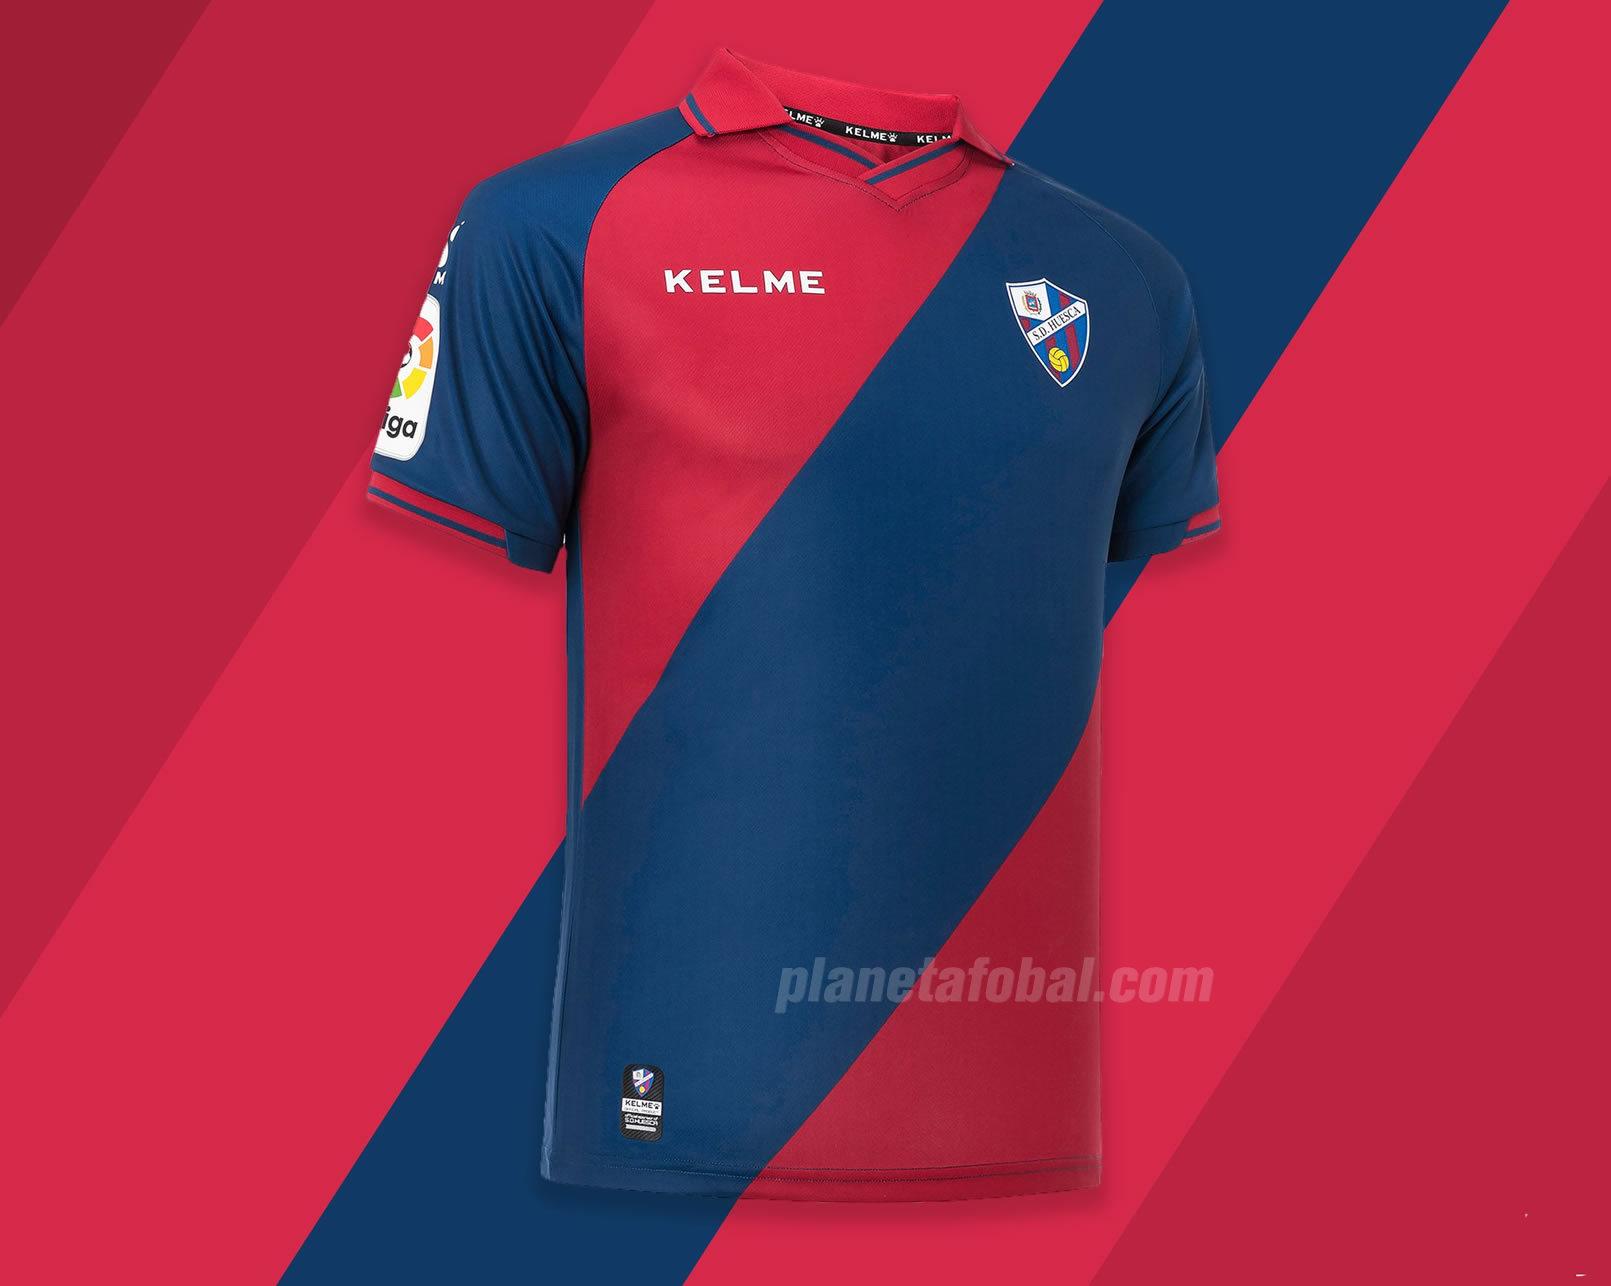 Primera equipación Kelme del SD Huesca 2018/19 | Imagen Twitter Oficial